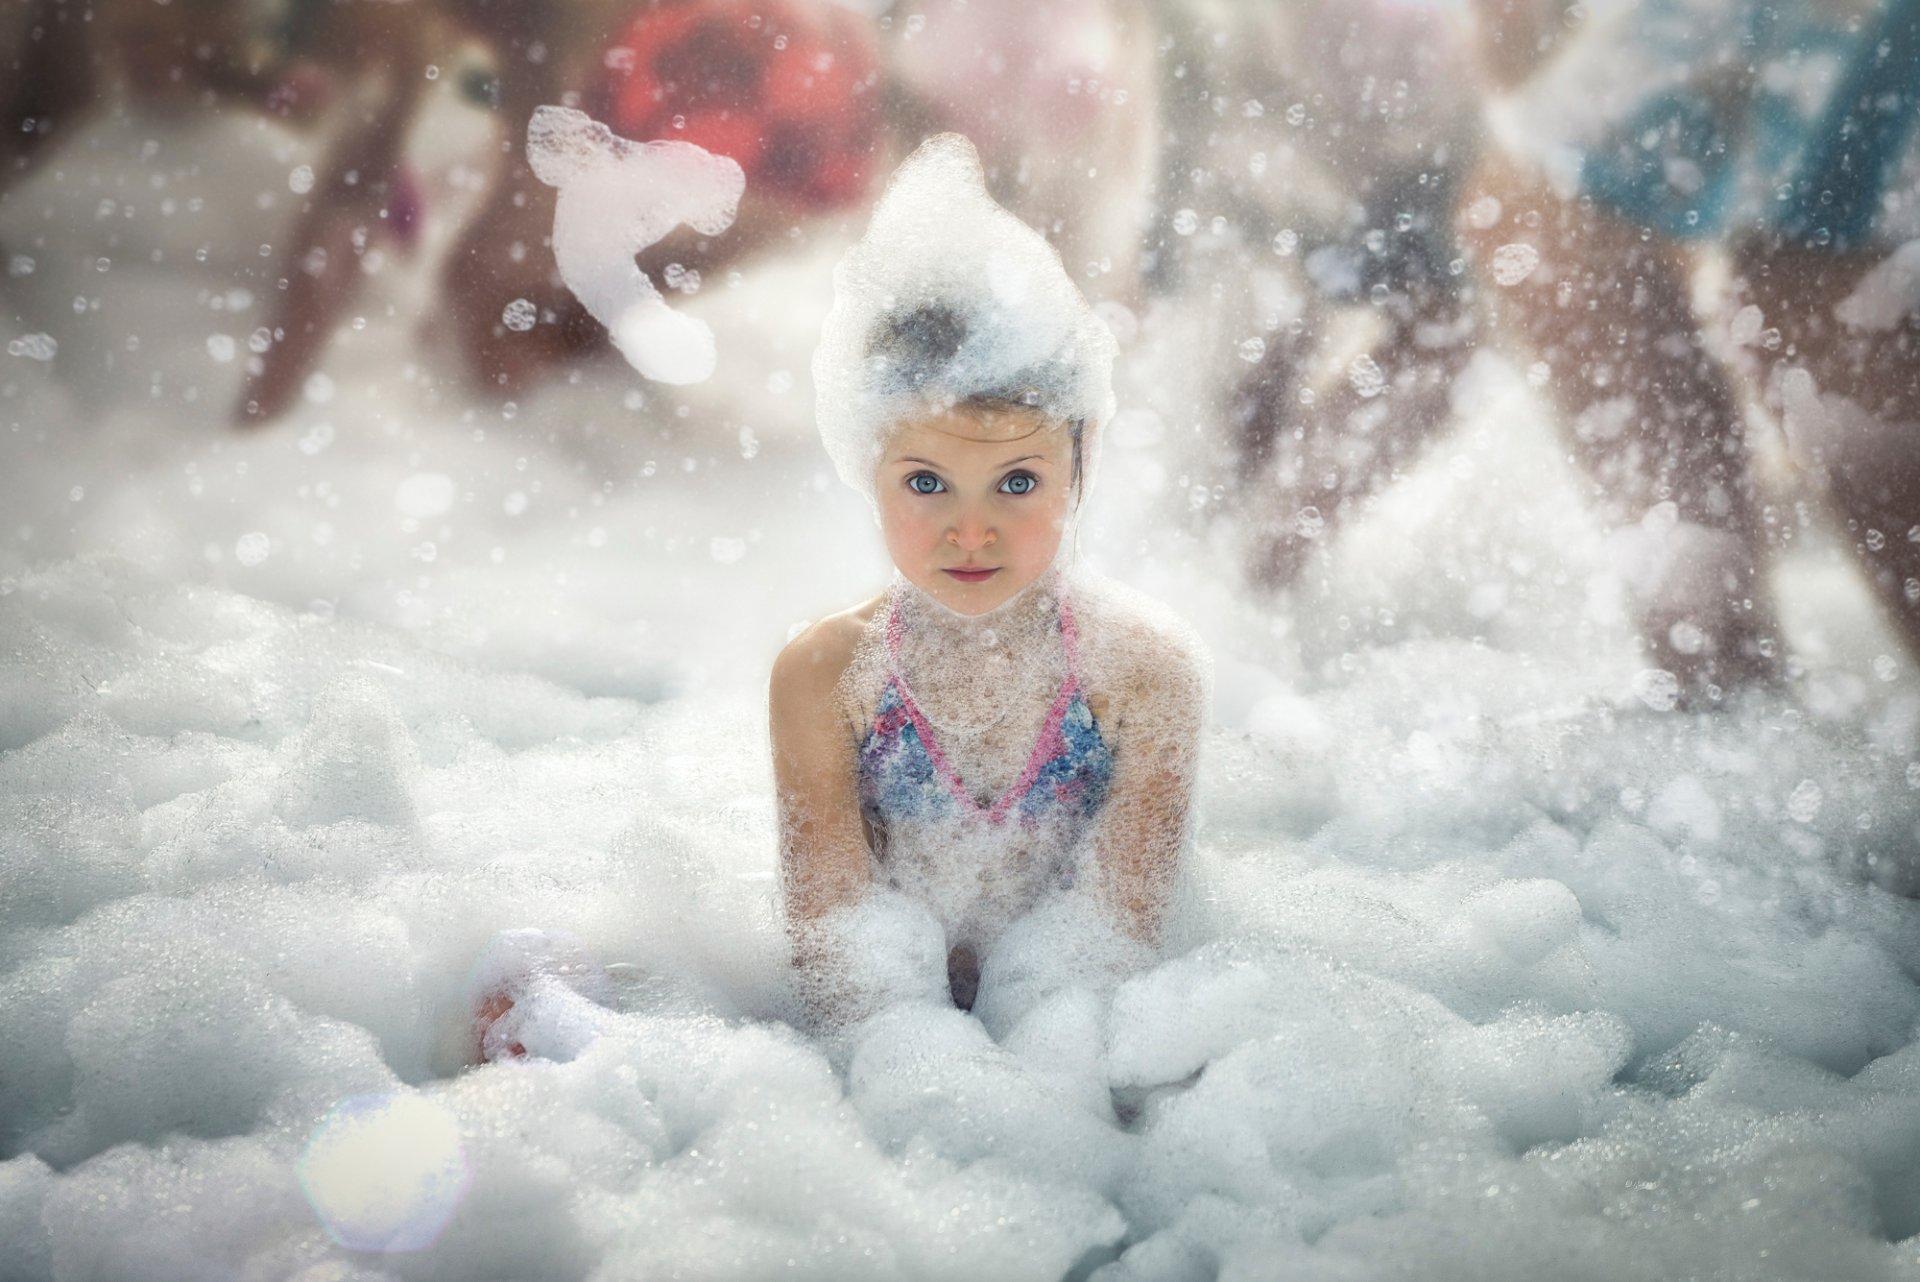 девушку намылили снегом торопливо, мешком